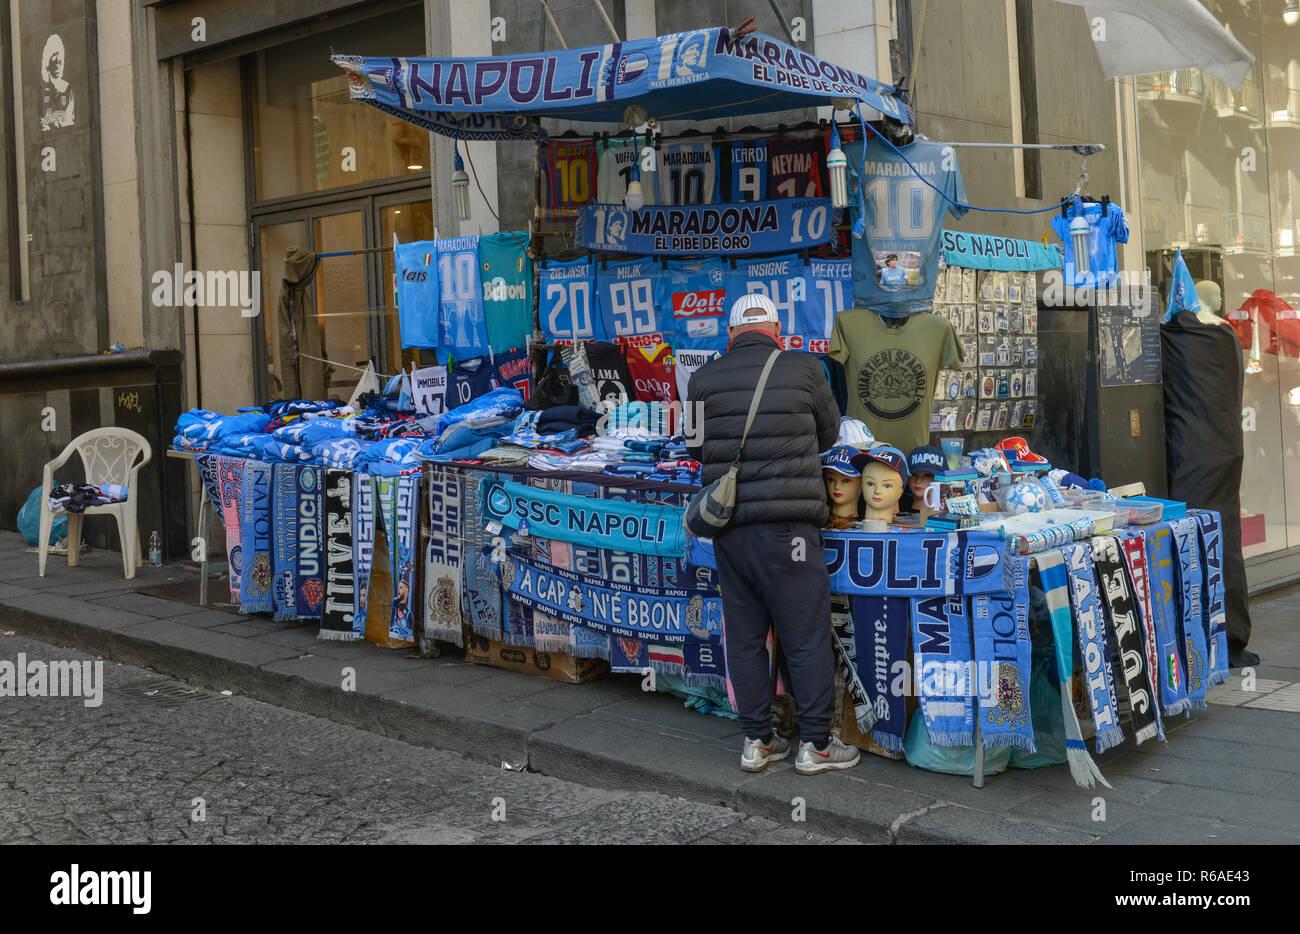 Fan scarfs, tricots, flags, Naples SSC, Naples, Italy , Fanschals, Trikots, Fahnen, SSC Neapel, Neapel, Italien - Stock Image